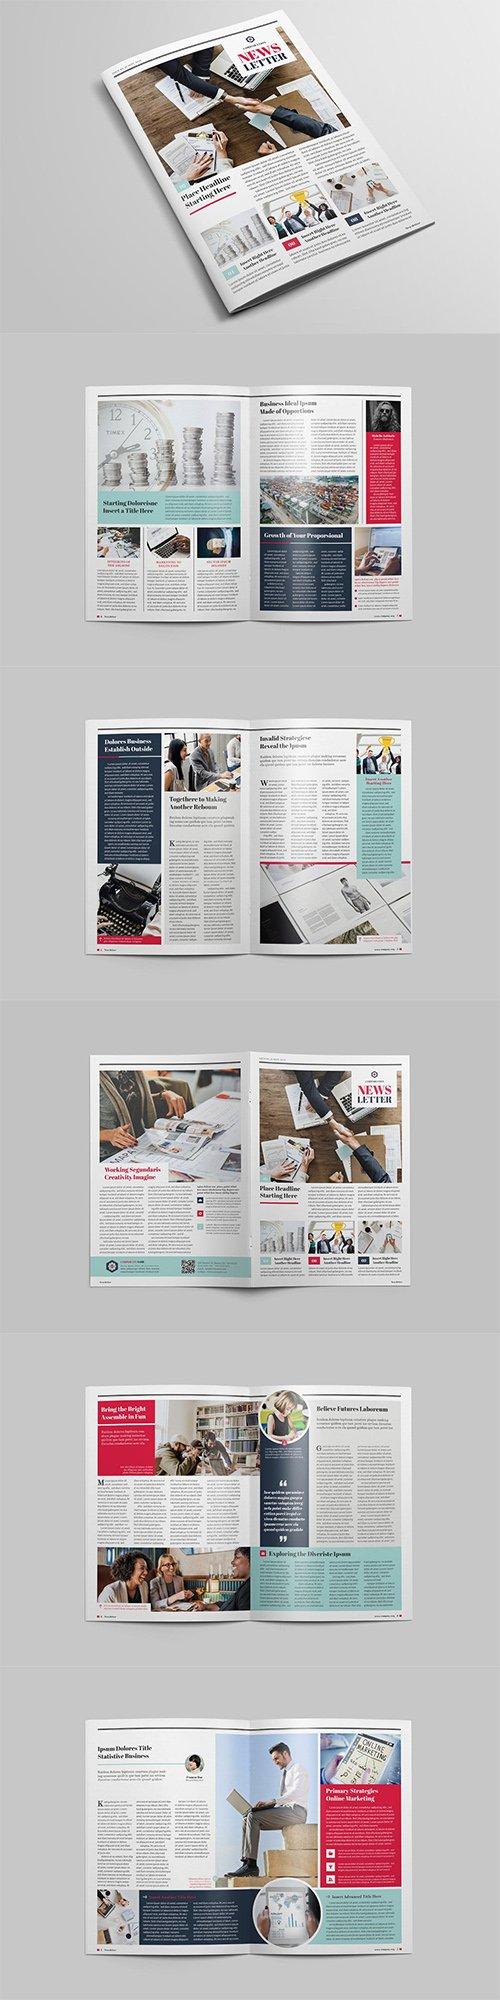 Multipurpose Newsletter Indesign